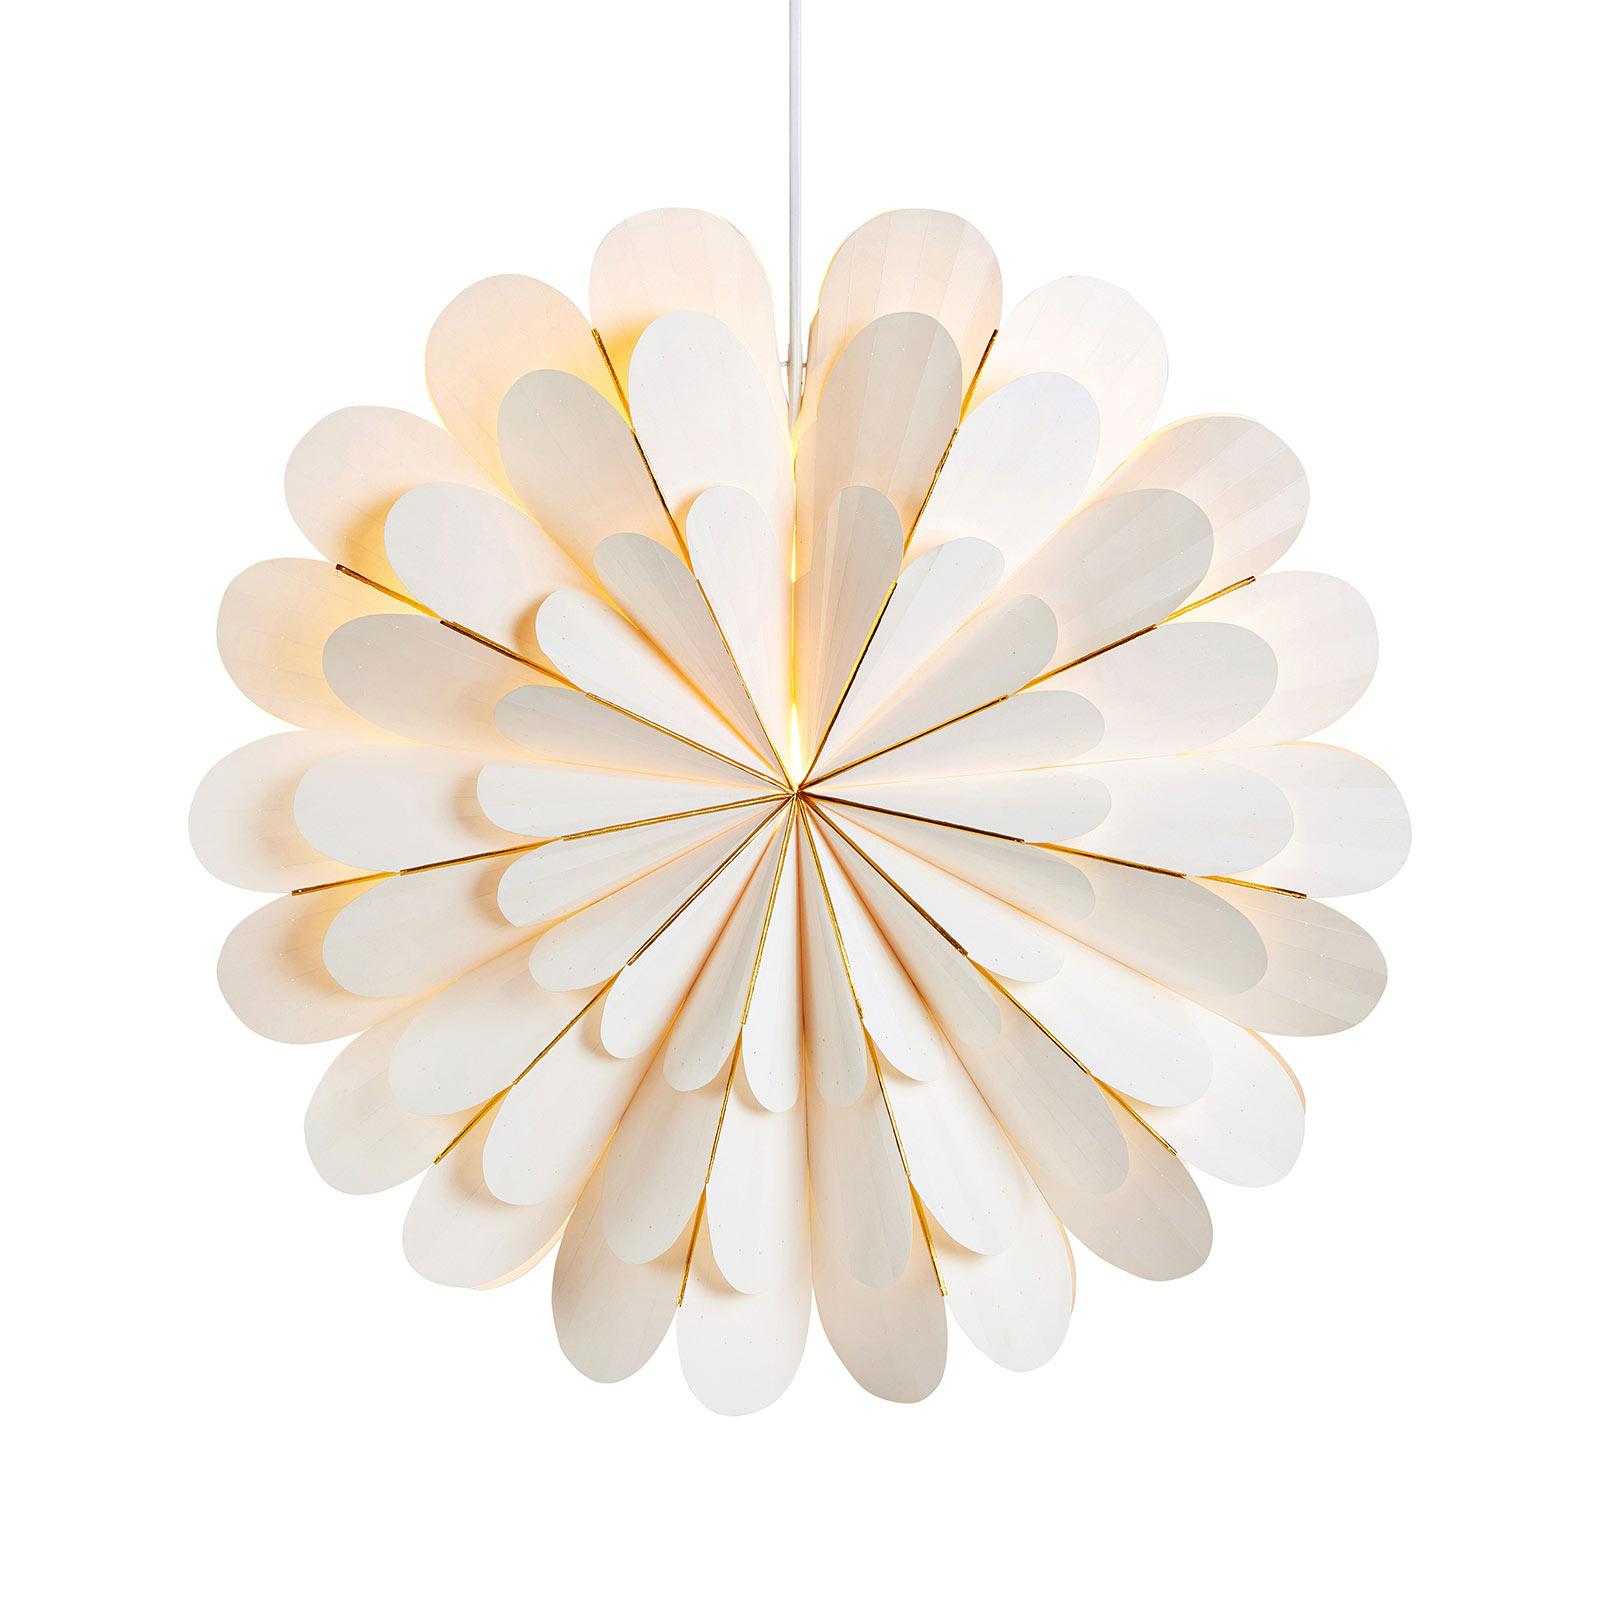 Decoratie ster Marigold als hanglamp, wit, Ø 45 cm